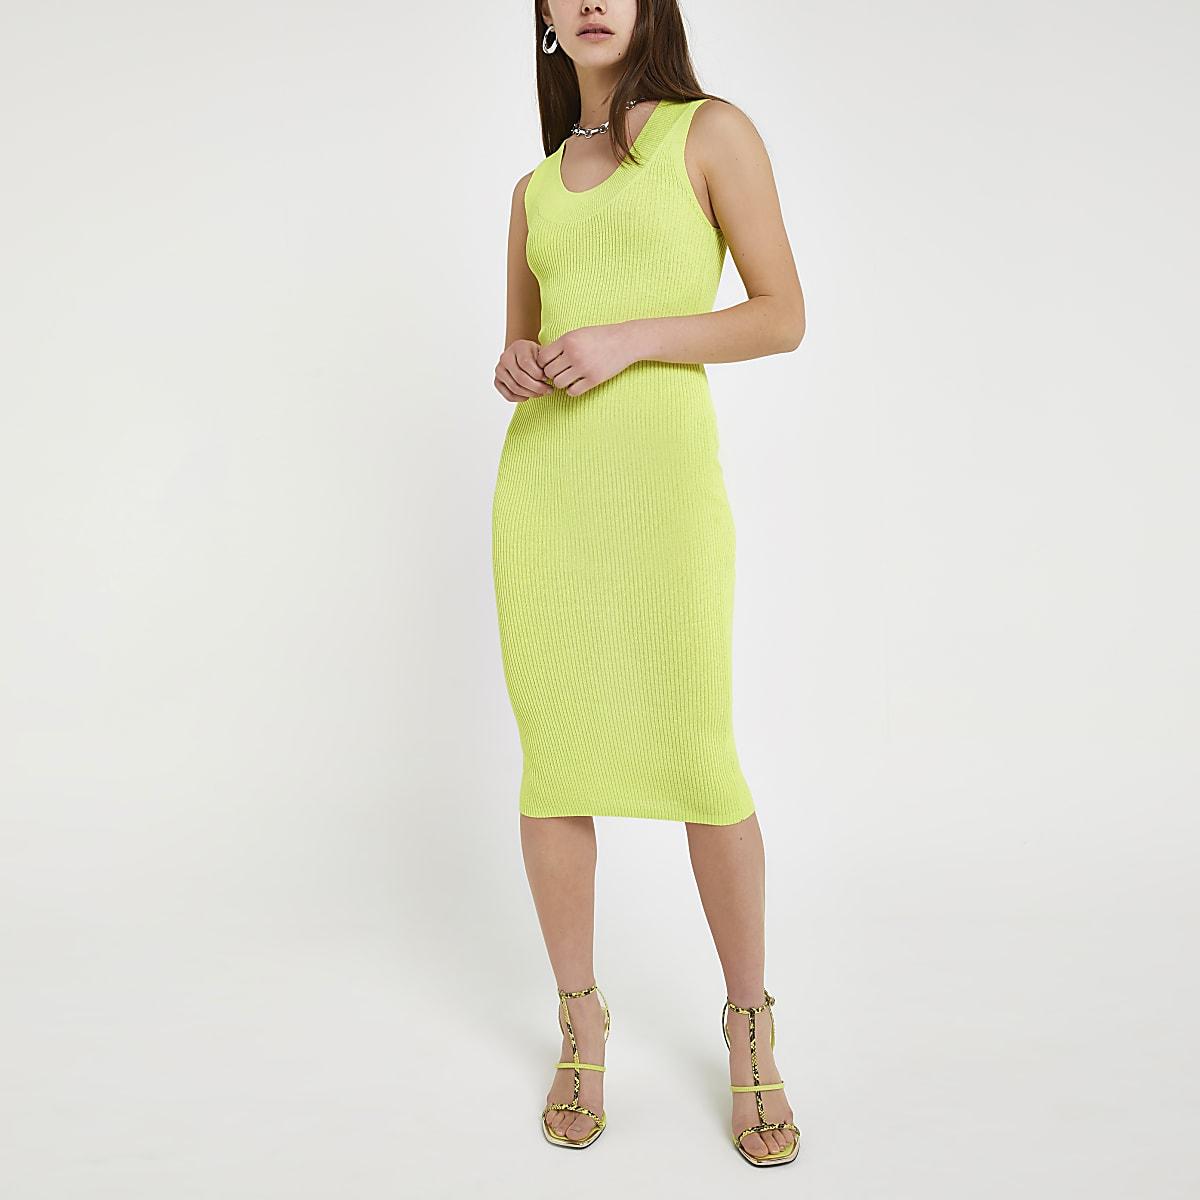 Petite neon yellow bodycon midi dress